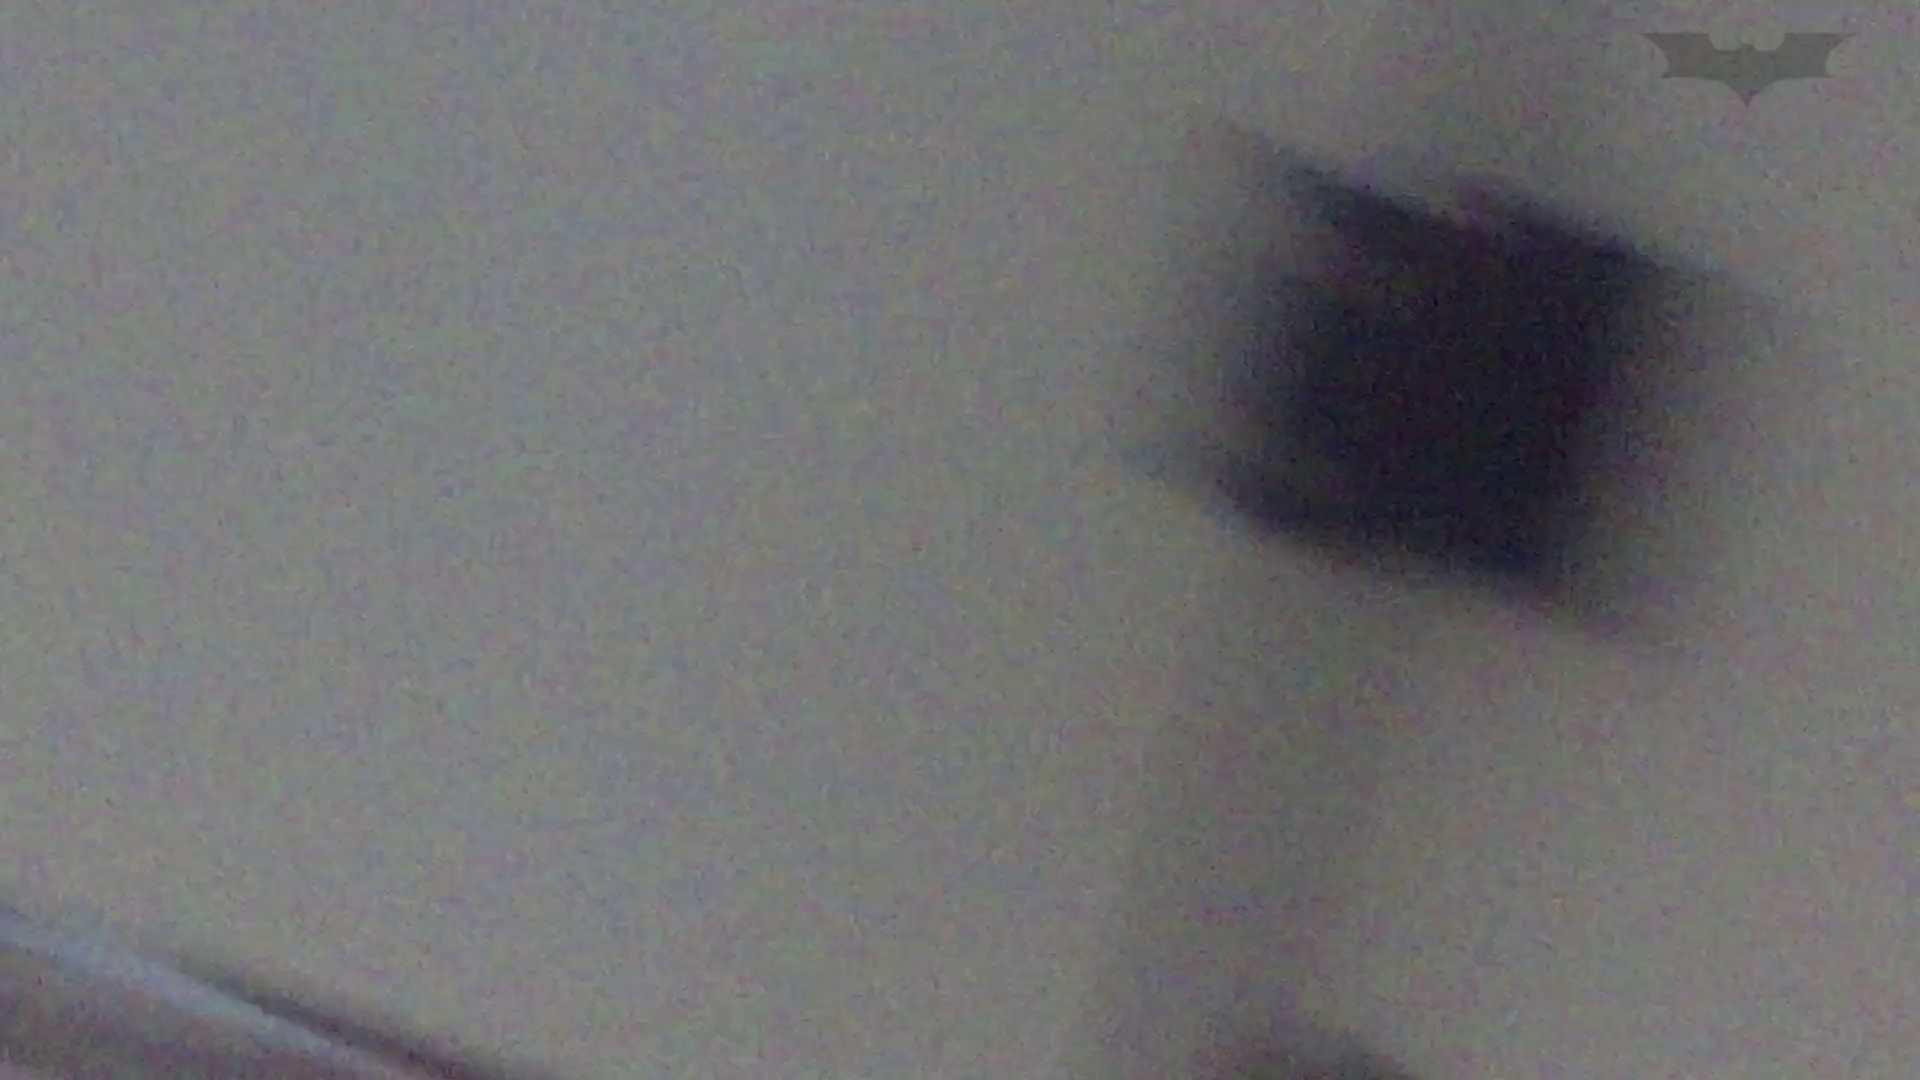 JD盗撮 美女の洗面所の秘密 Vol.72 丸見え ヌード画像 74画像 36